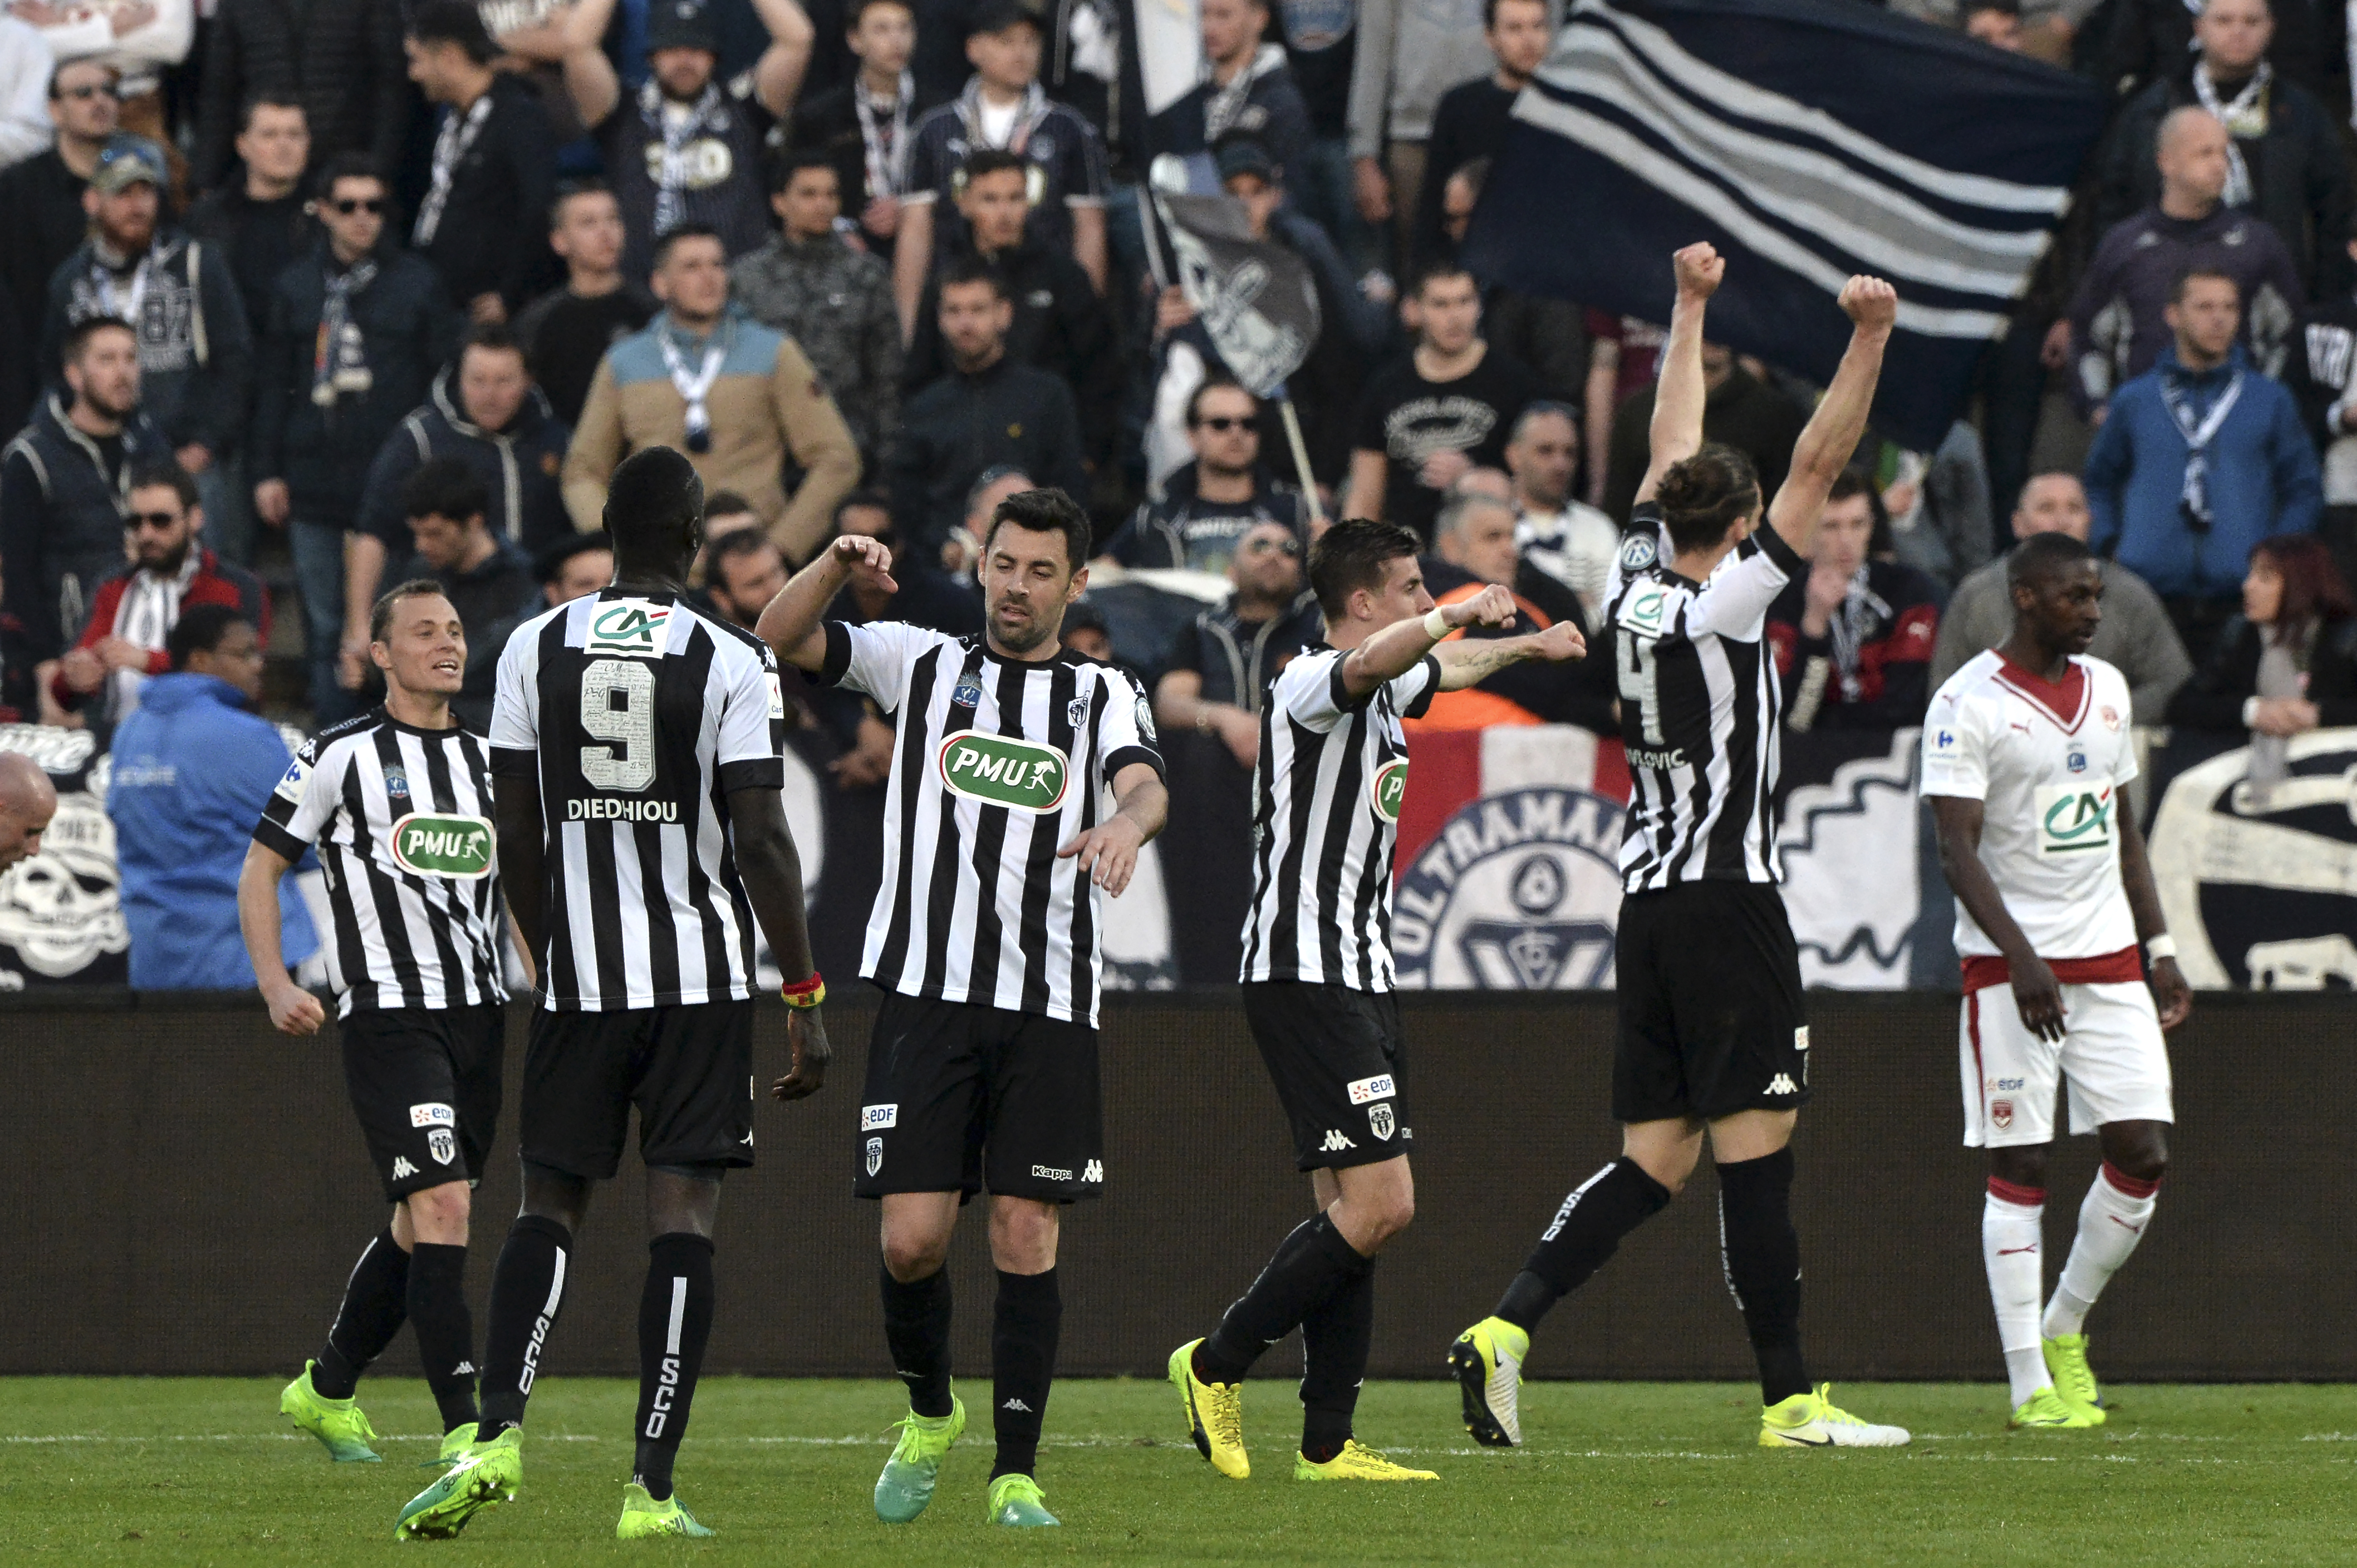 Angers : première réussie au stade Raymond Kopa